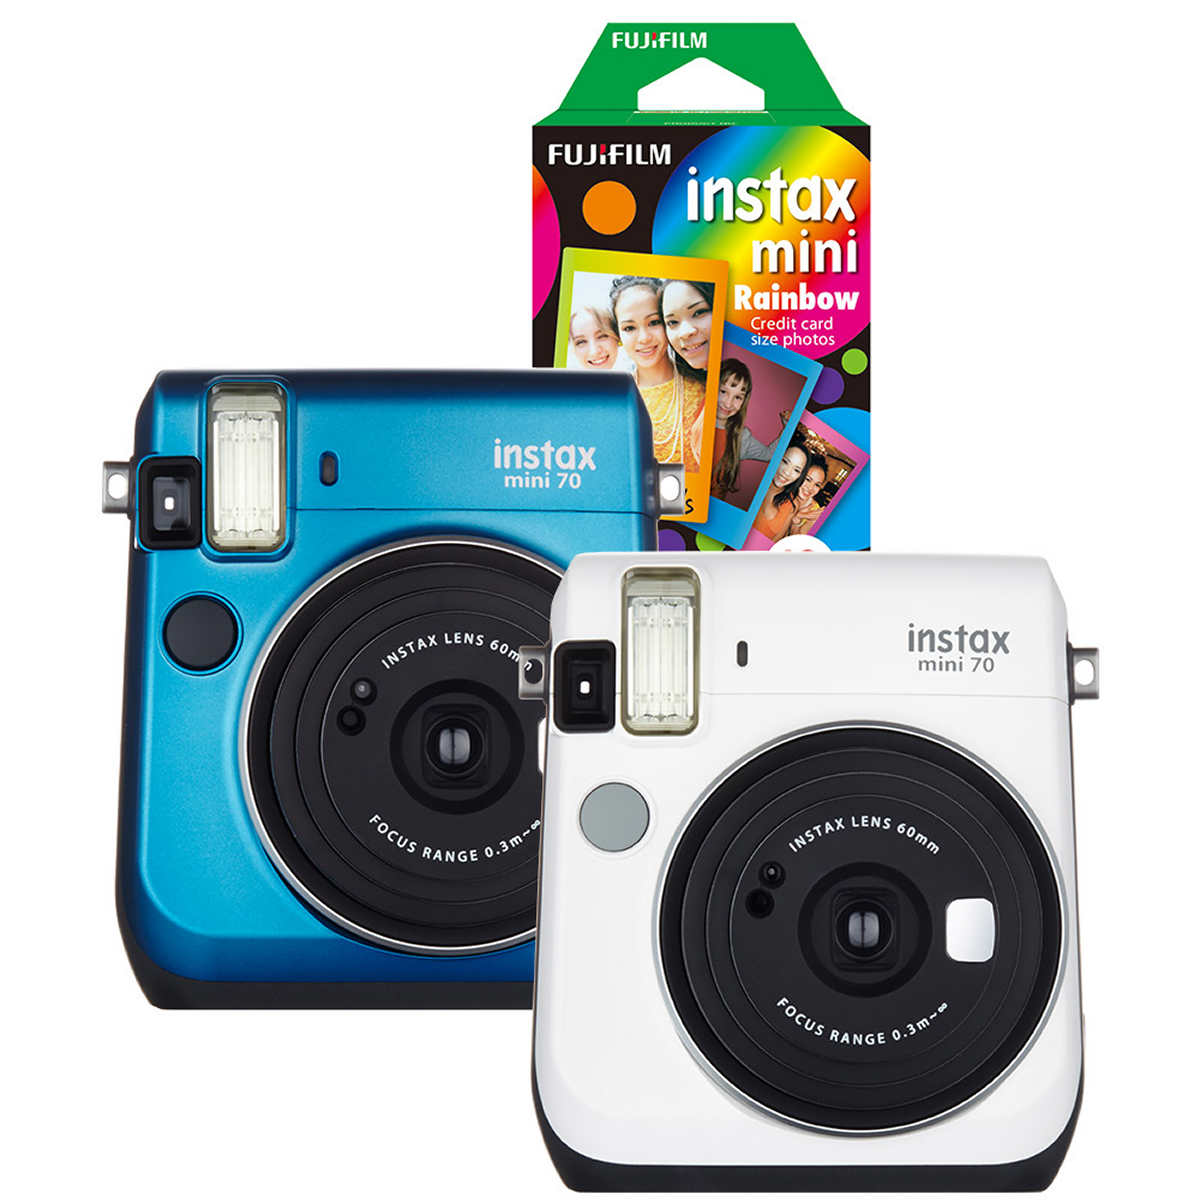 FUJIFILM instax Mini 70 Camera Bundle